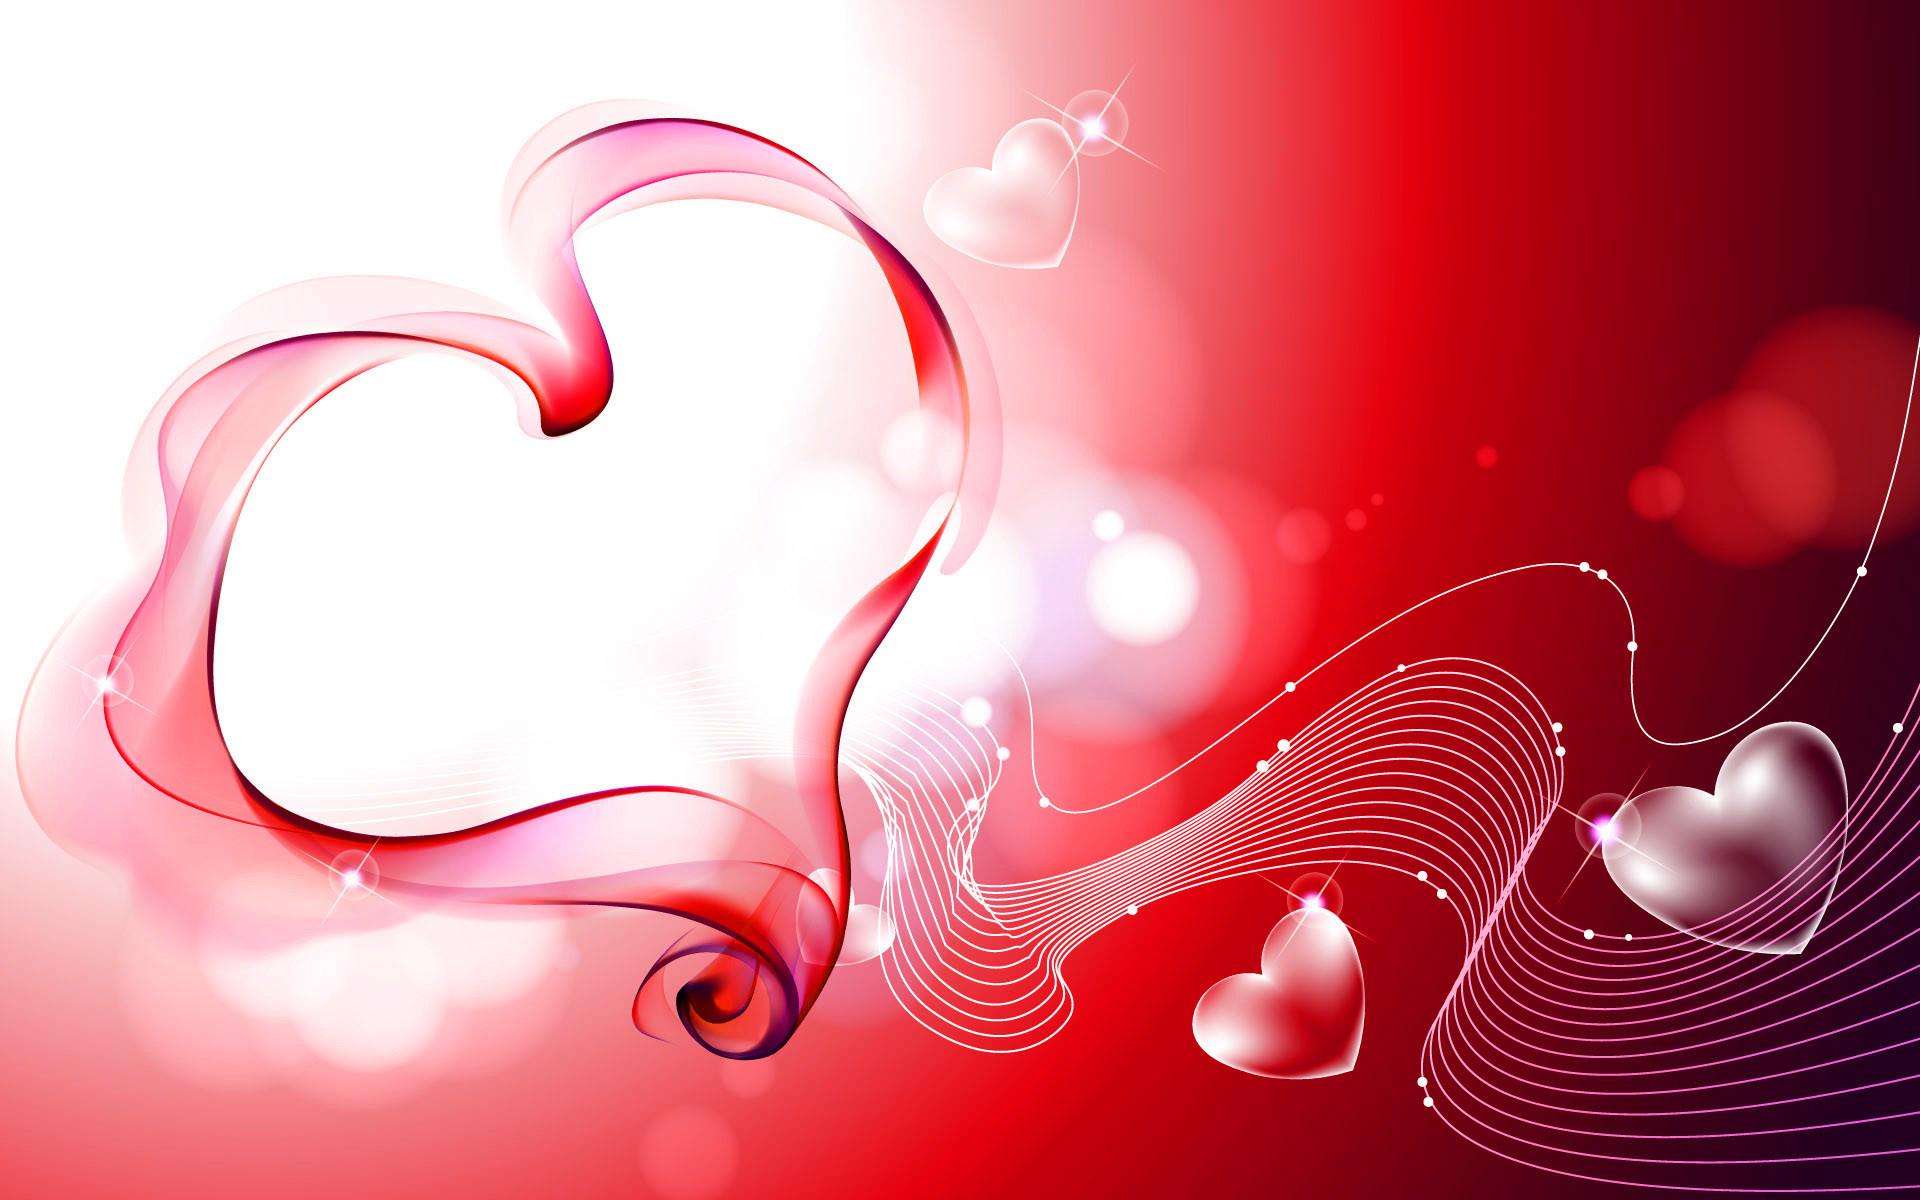 floral 3d pink valentine heart HD wallpaper Wallpaper